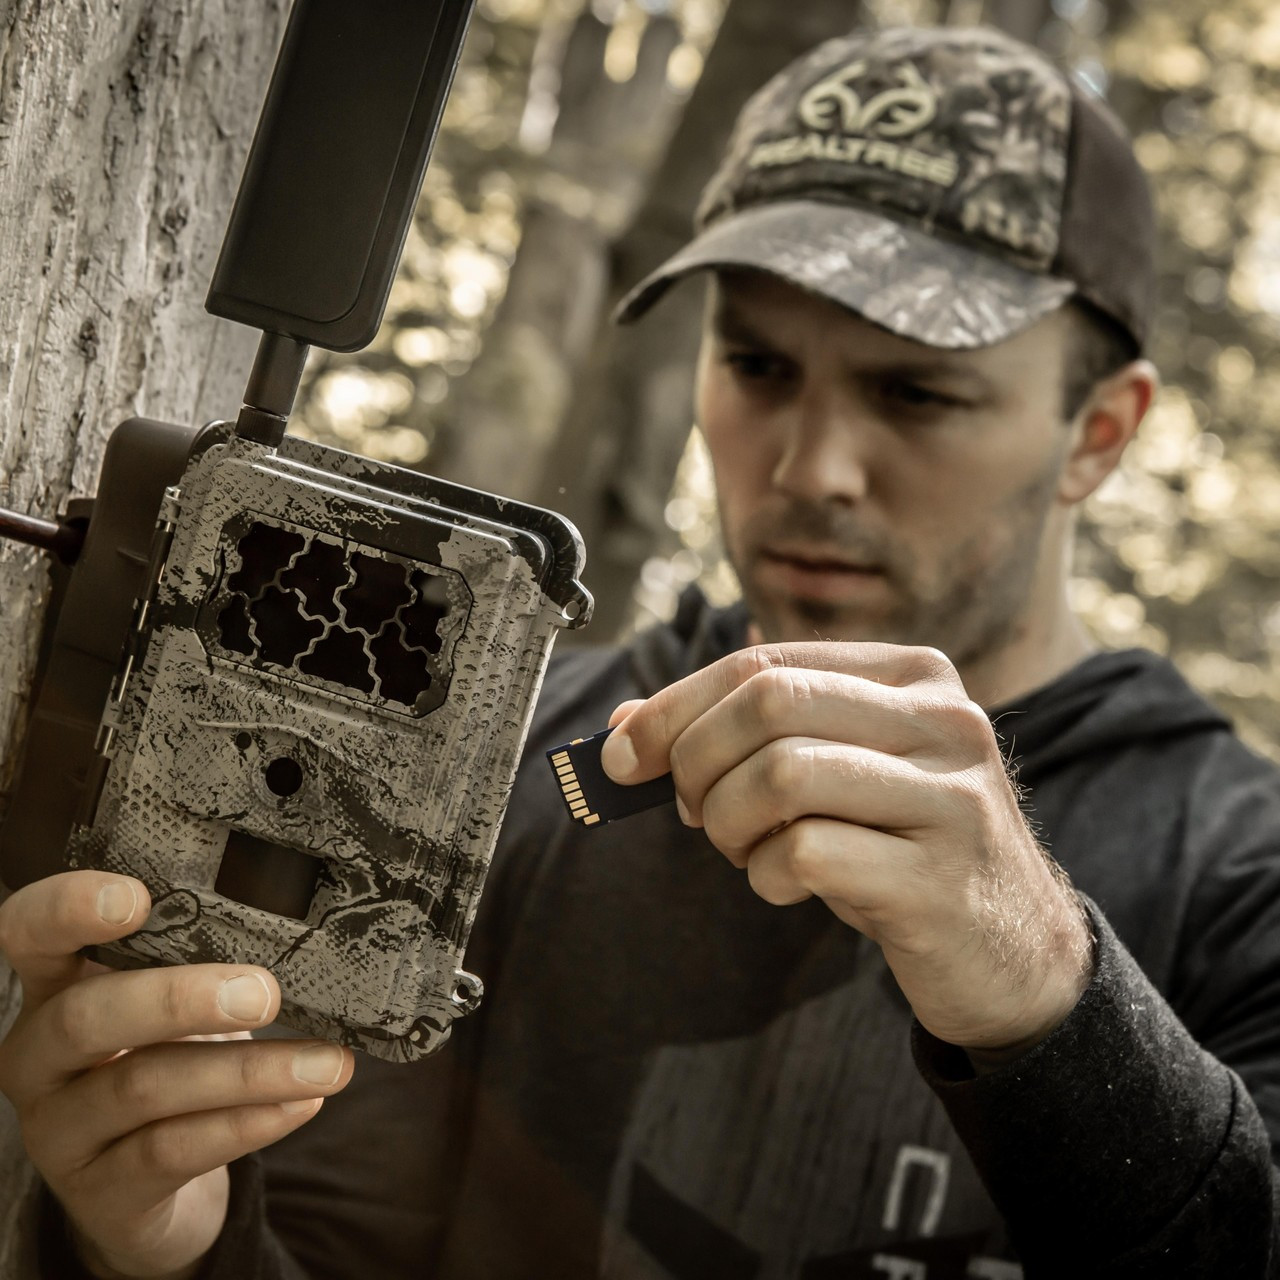 Setting Up AT&T 4G Spartan Trail Camera